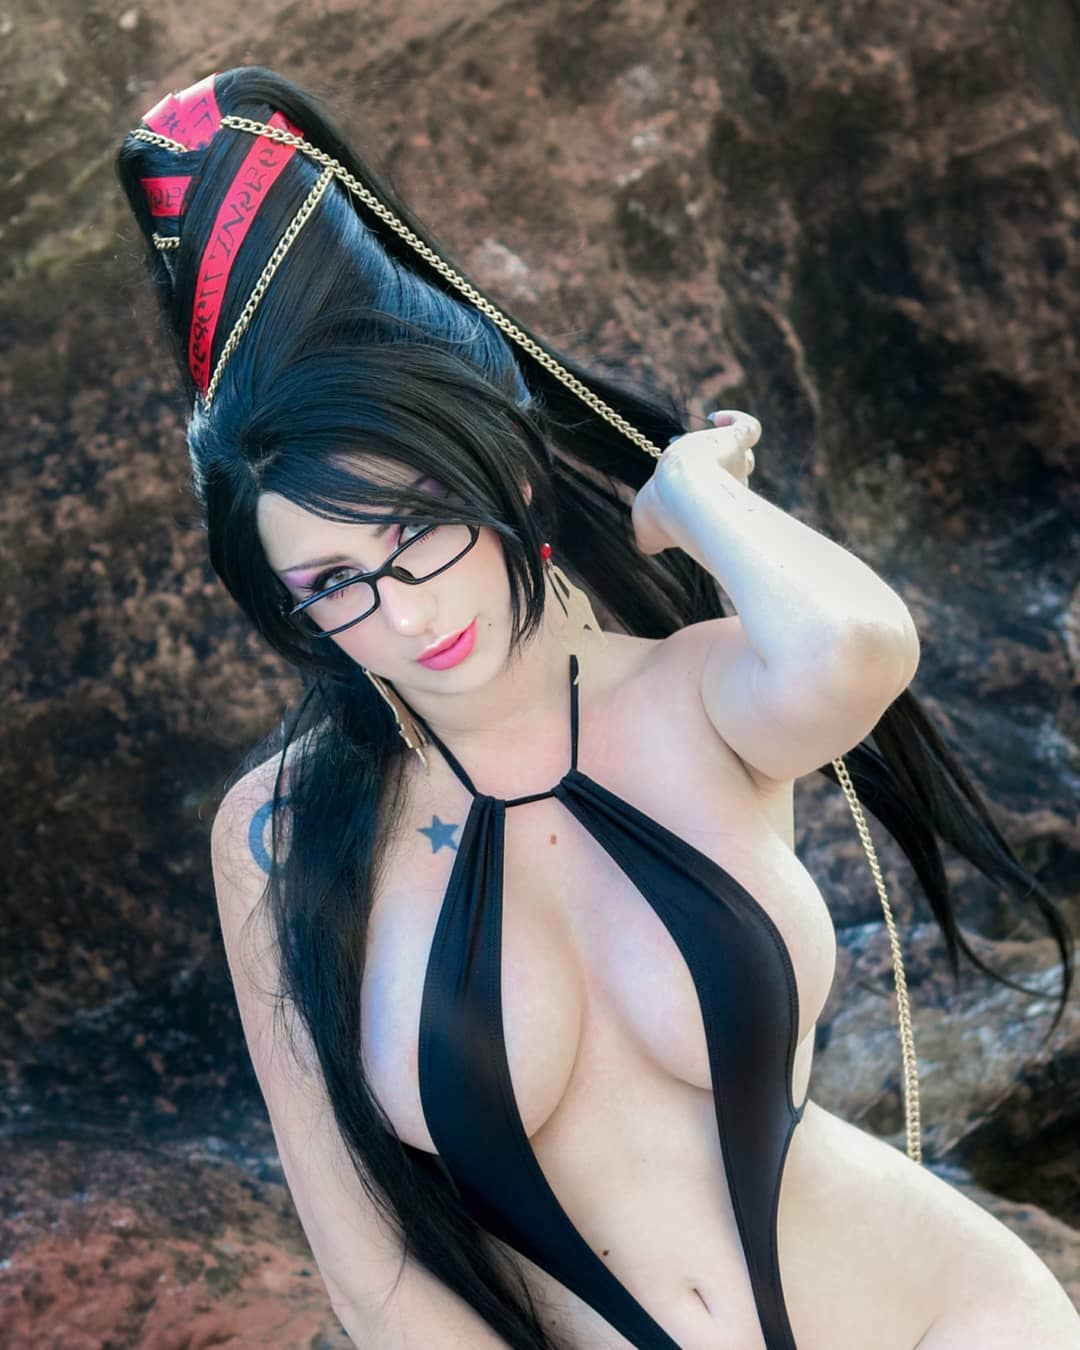 Bikini Bayonetta By Giu Hellsing